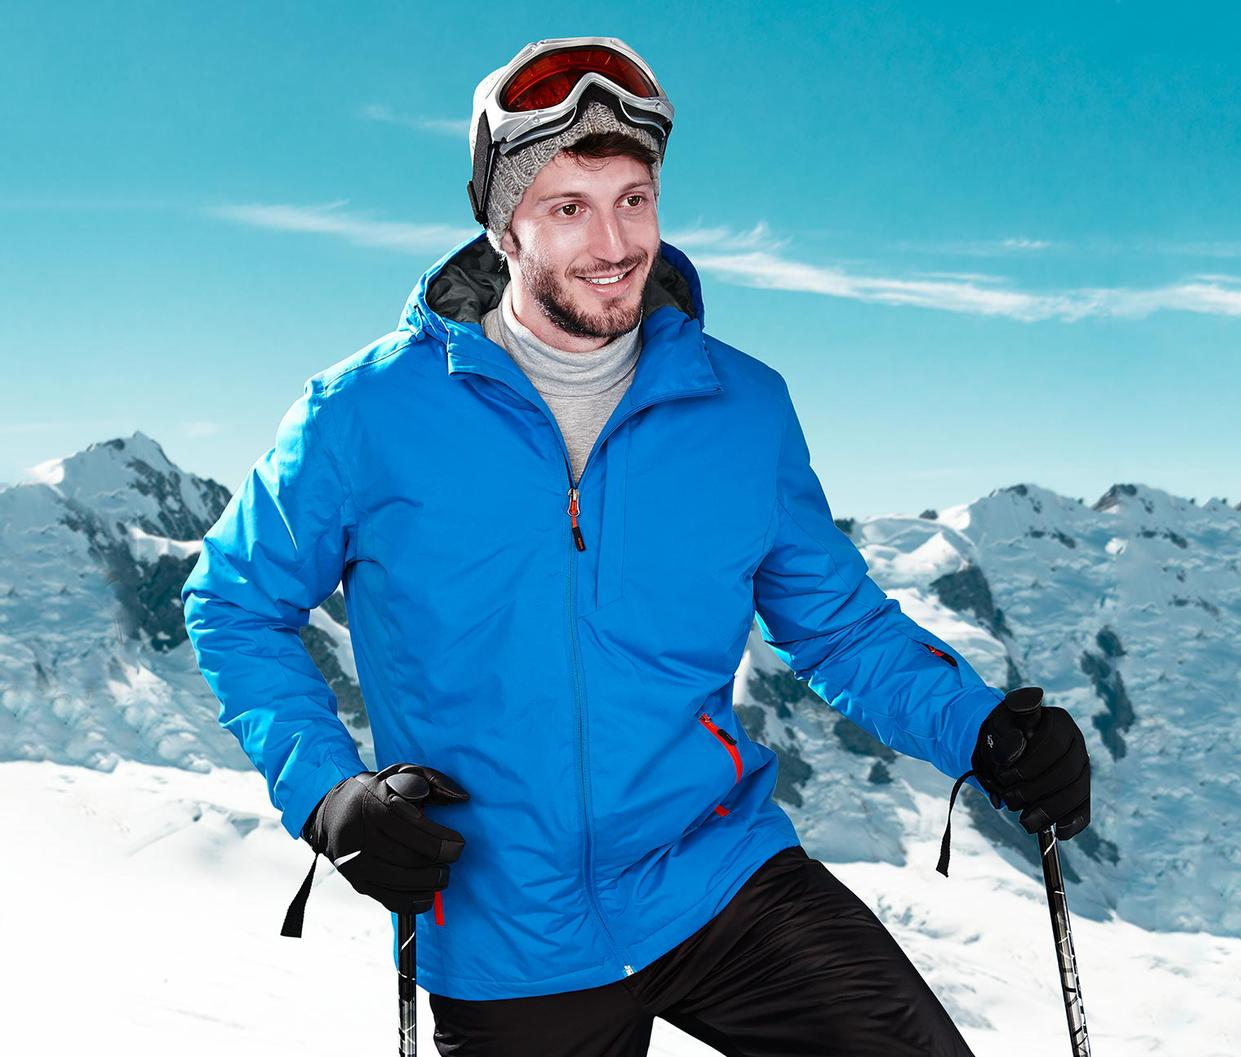 Men Winter Skiing Jackets Outdoor Waterproof Windproof Cotton-padded Hiking Jacket Men Sports Skiing Men Clothing Size L/XL <br><br>Aliexpress